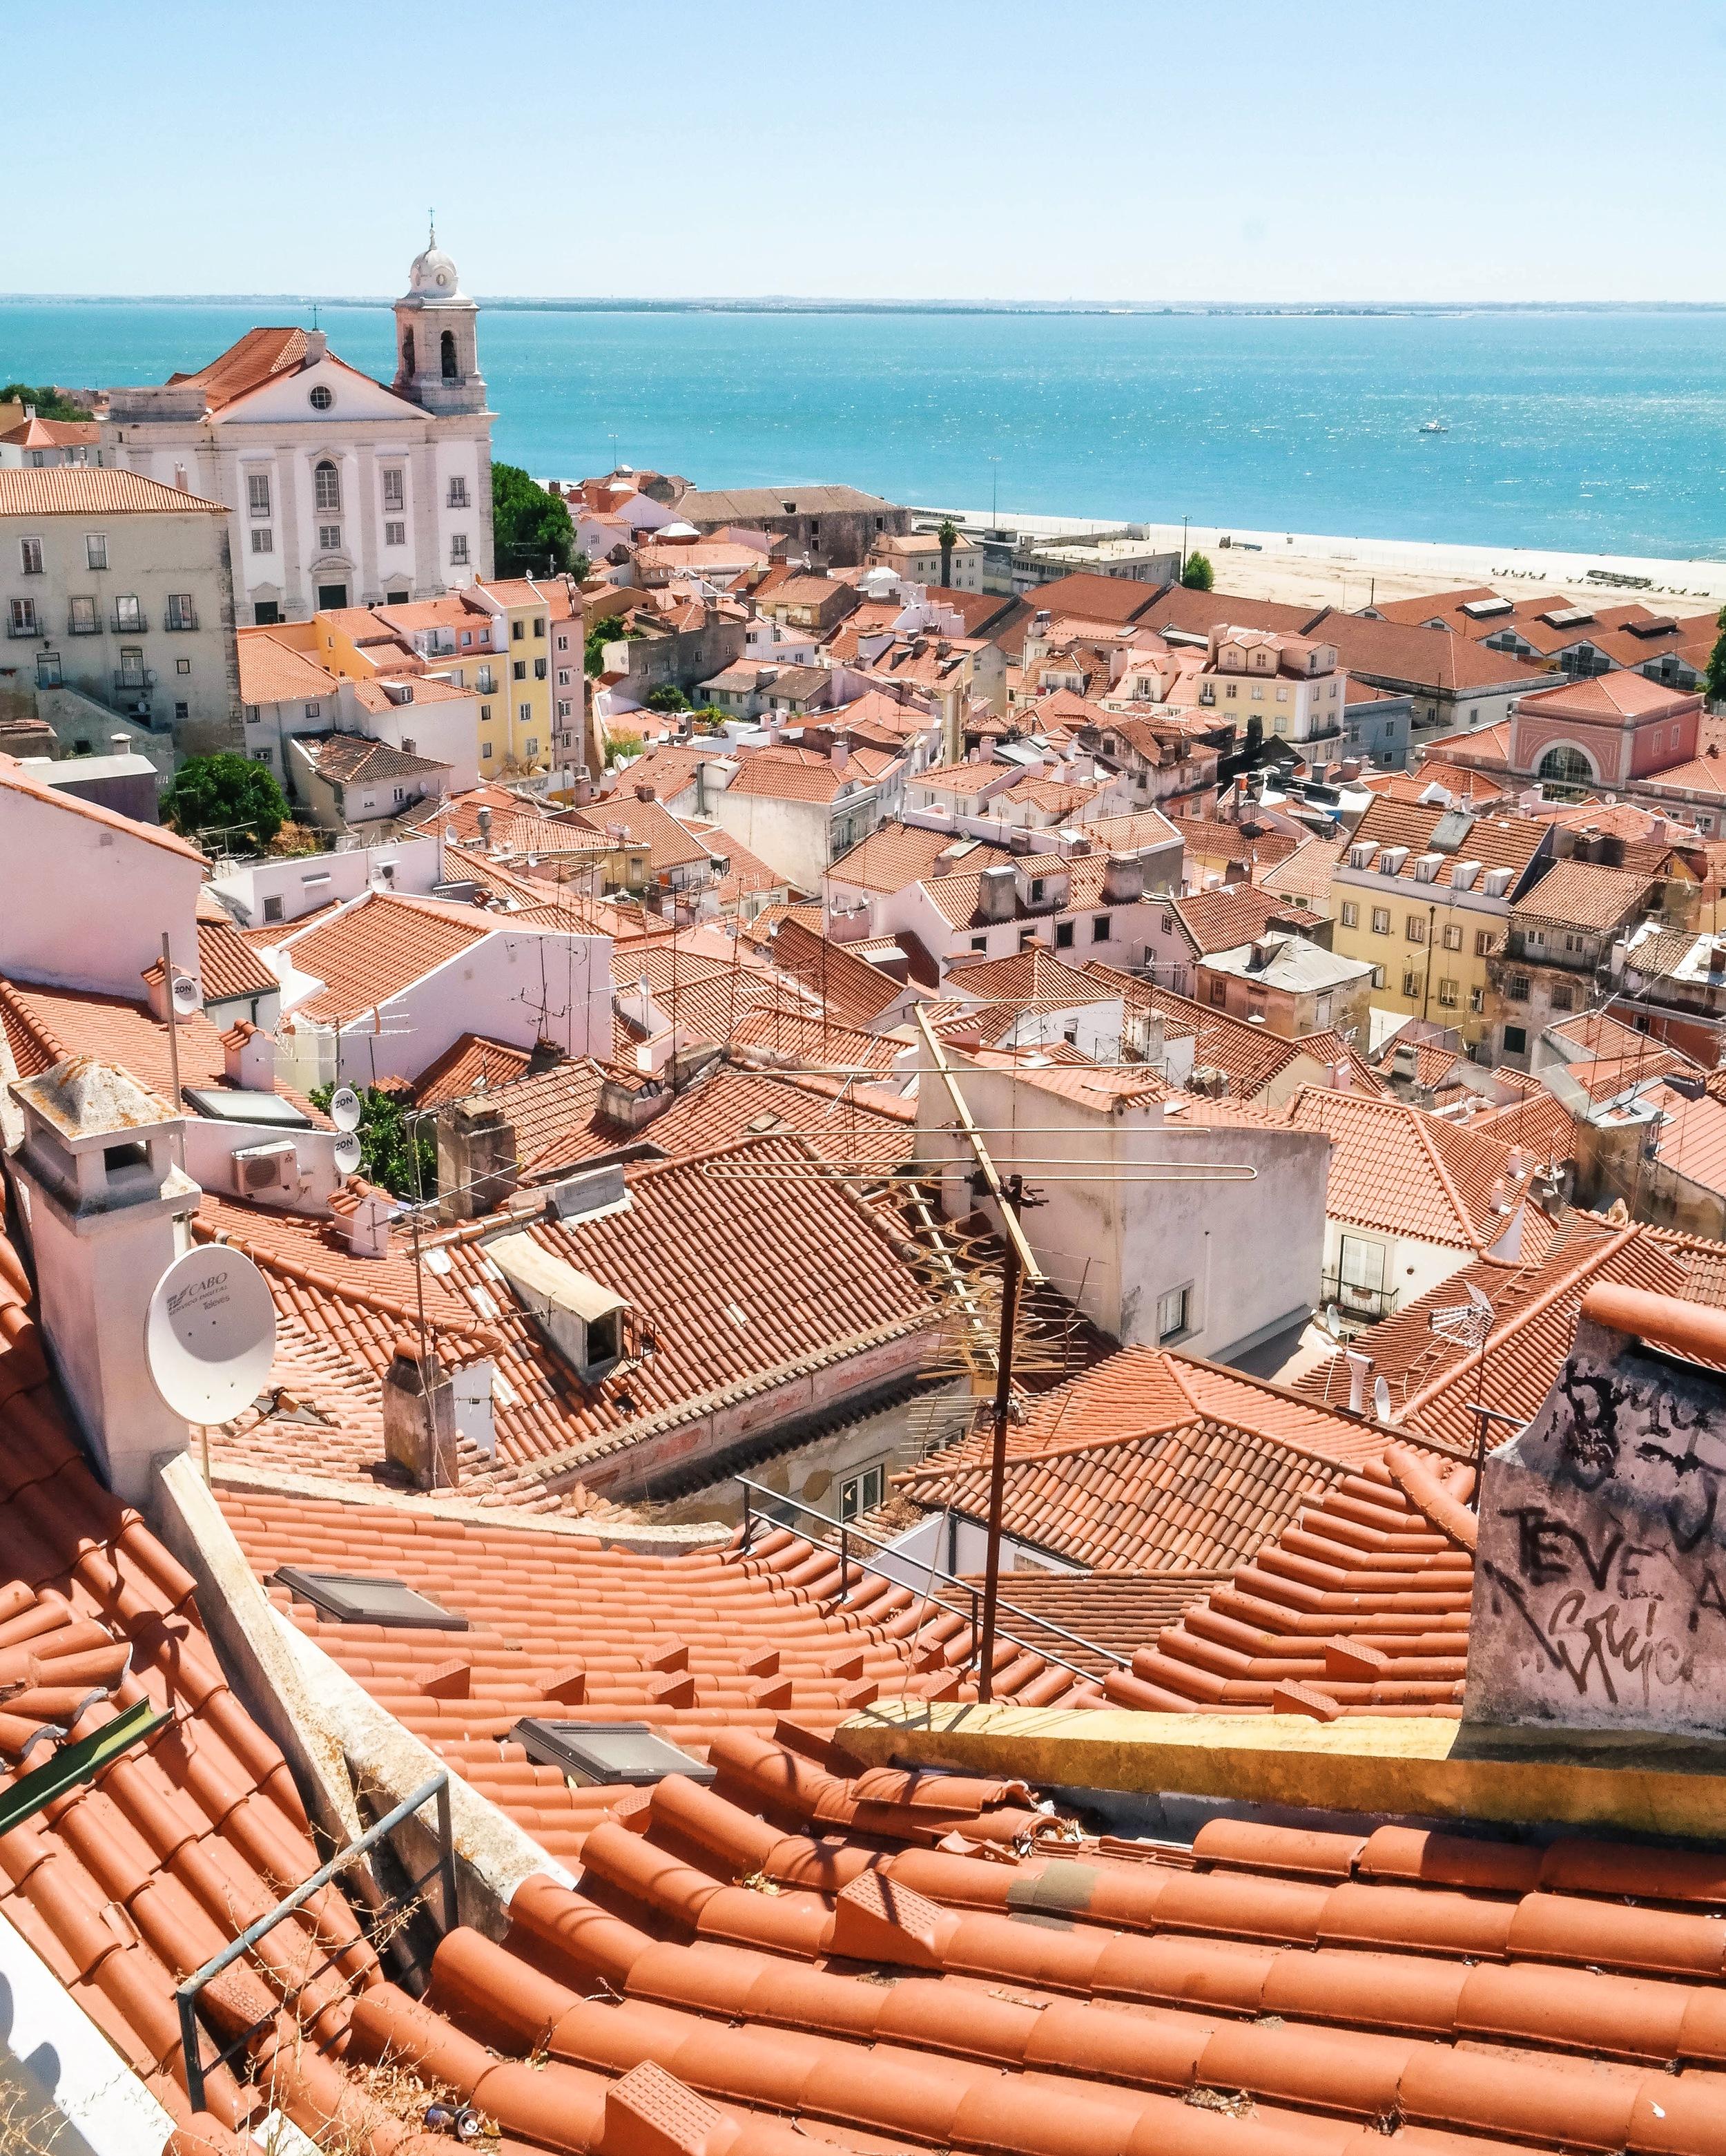 Lisbon, Portugal taken with a Samsung NX500